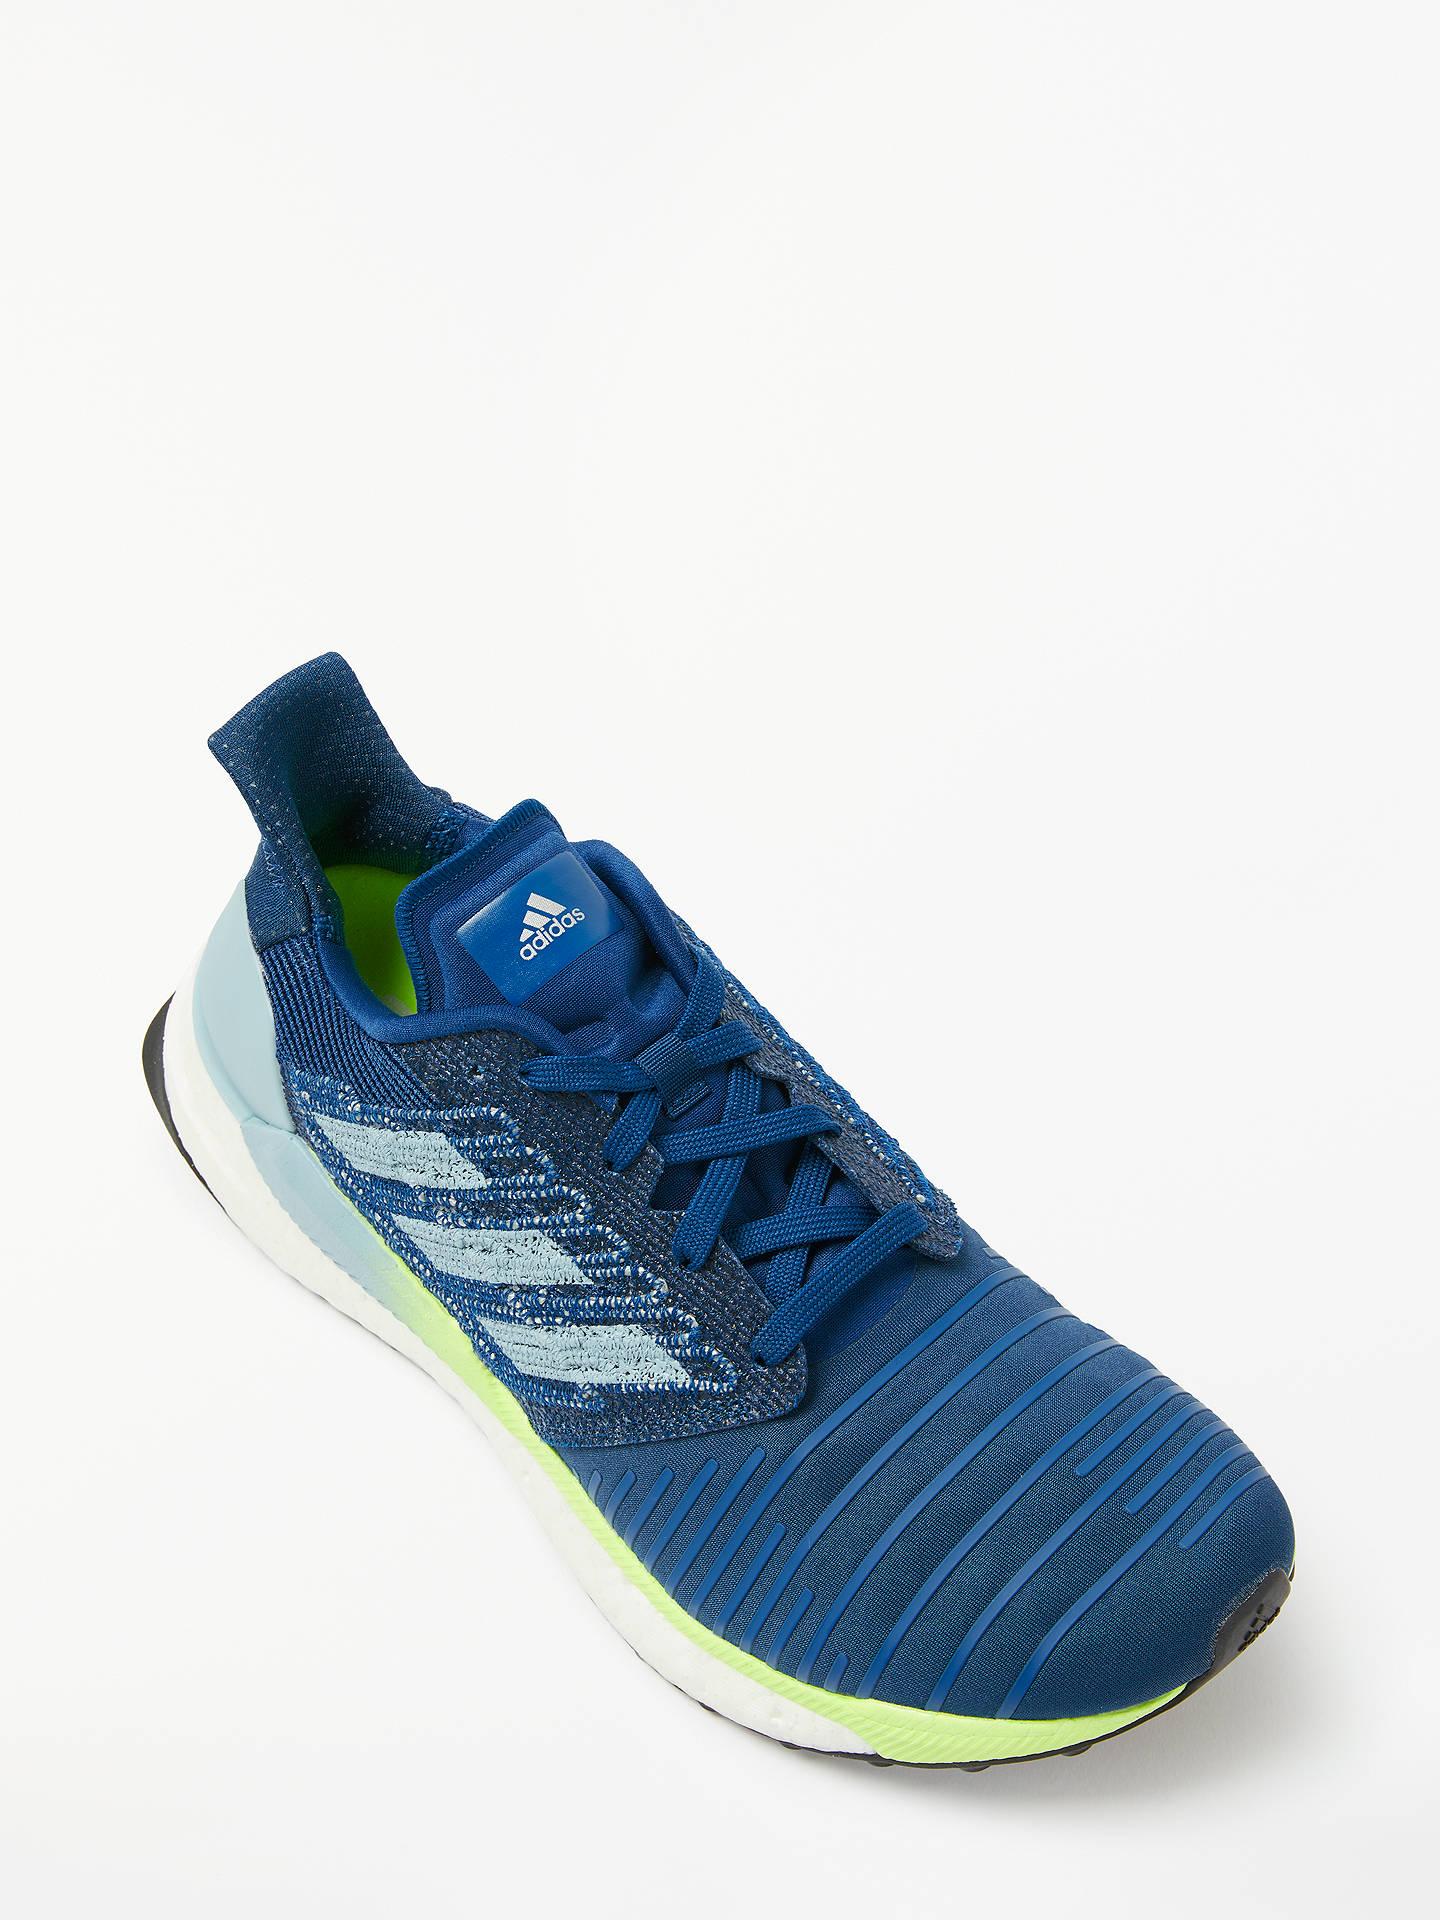 442a2c9bcd adidas Solar Boost Men's Running Shoes, Legend Marine/Ash Grey at ...